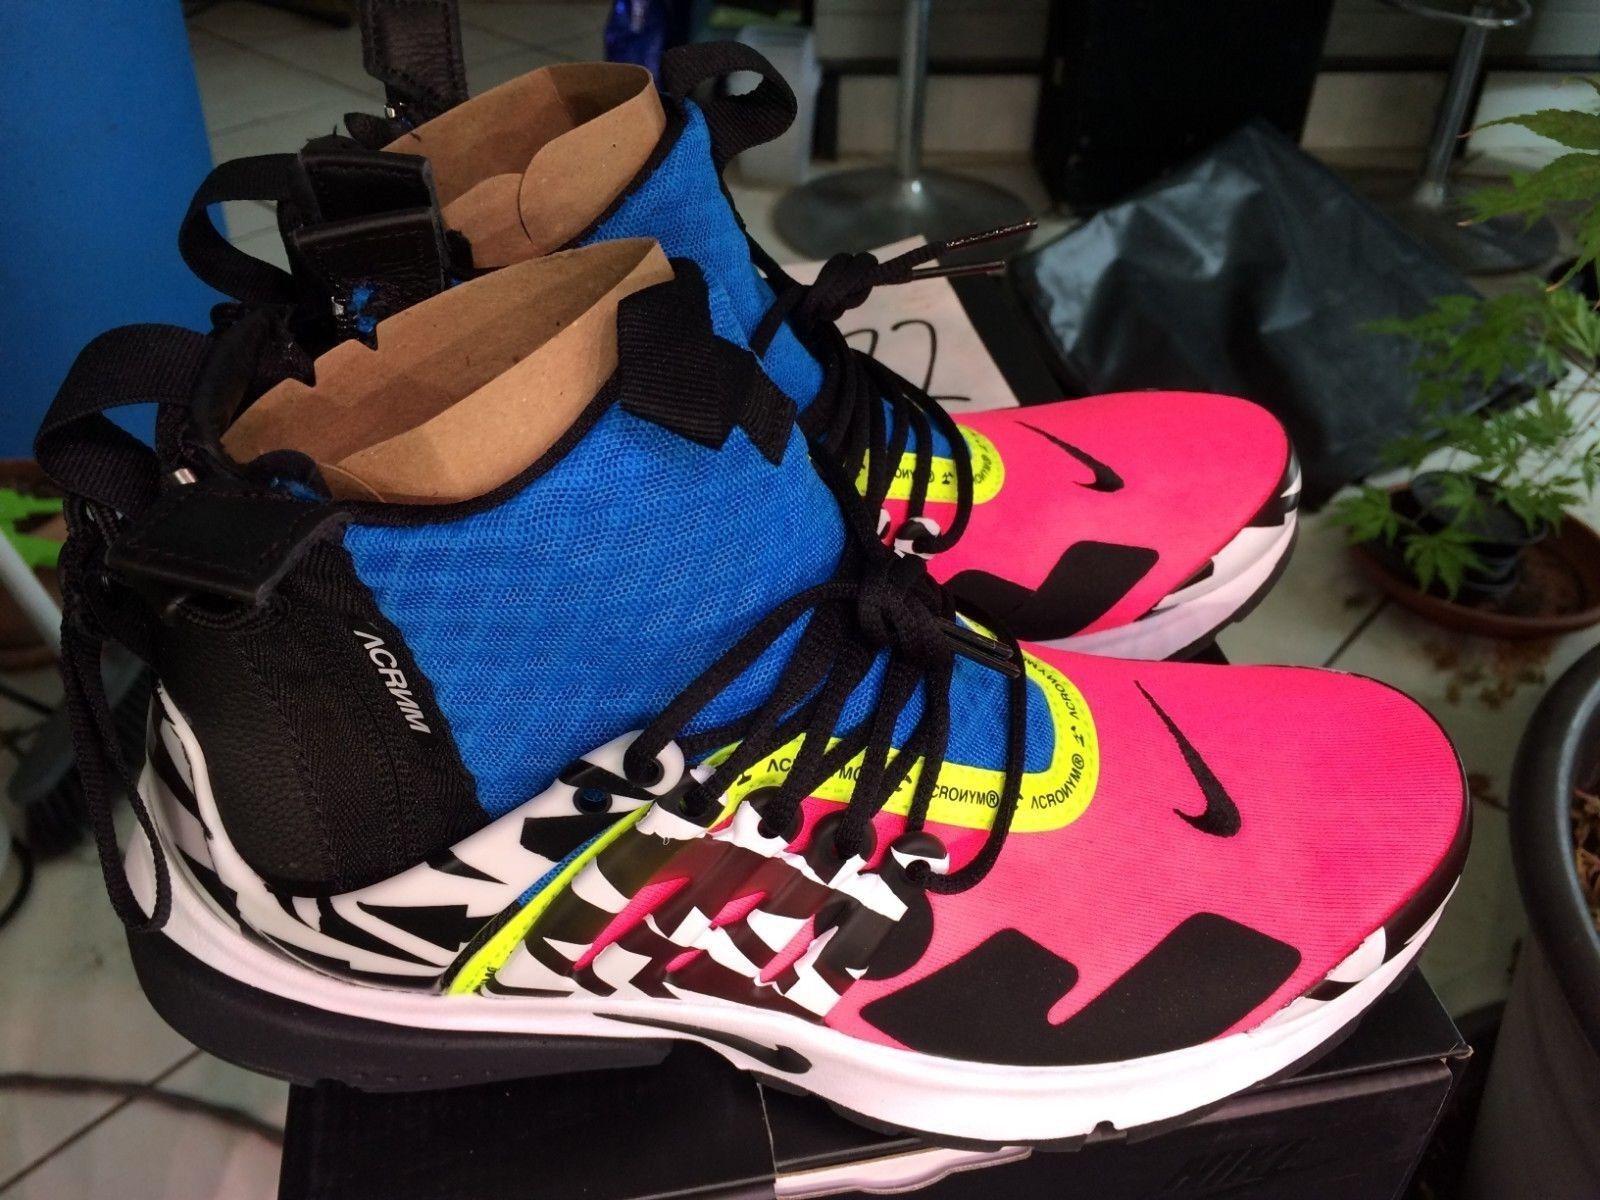 Nike Air Presto Mid Utility x Acronym scarpe RACER rosa  6 US Eu 40 Jp 25